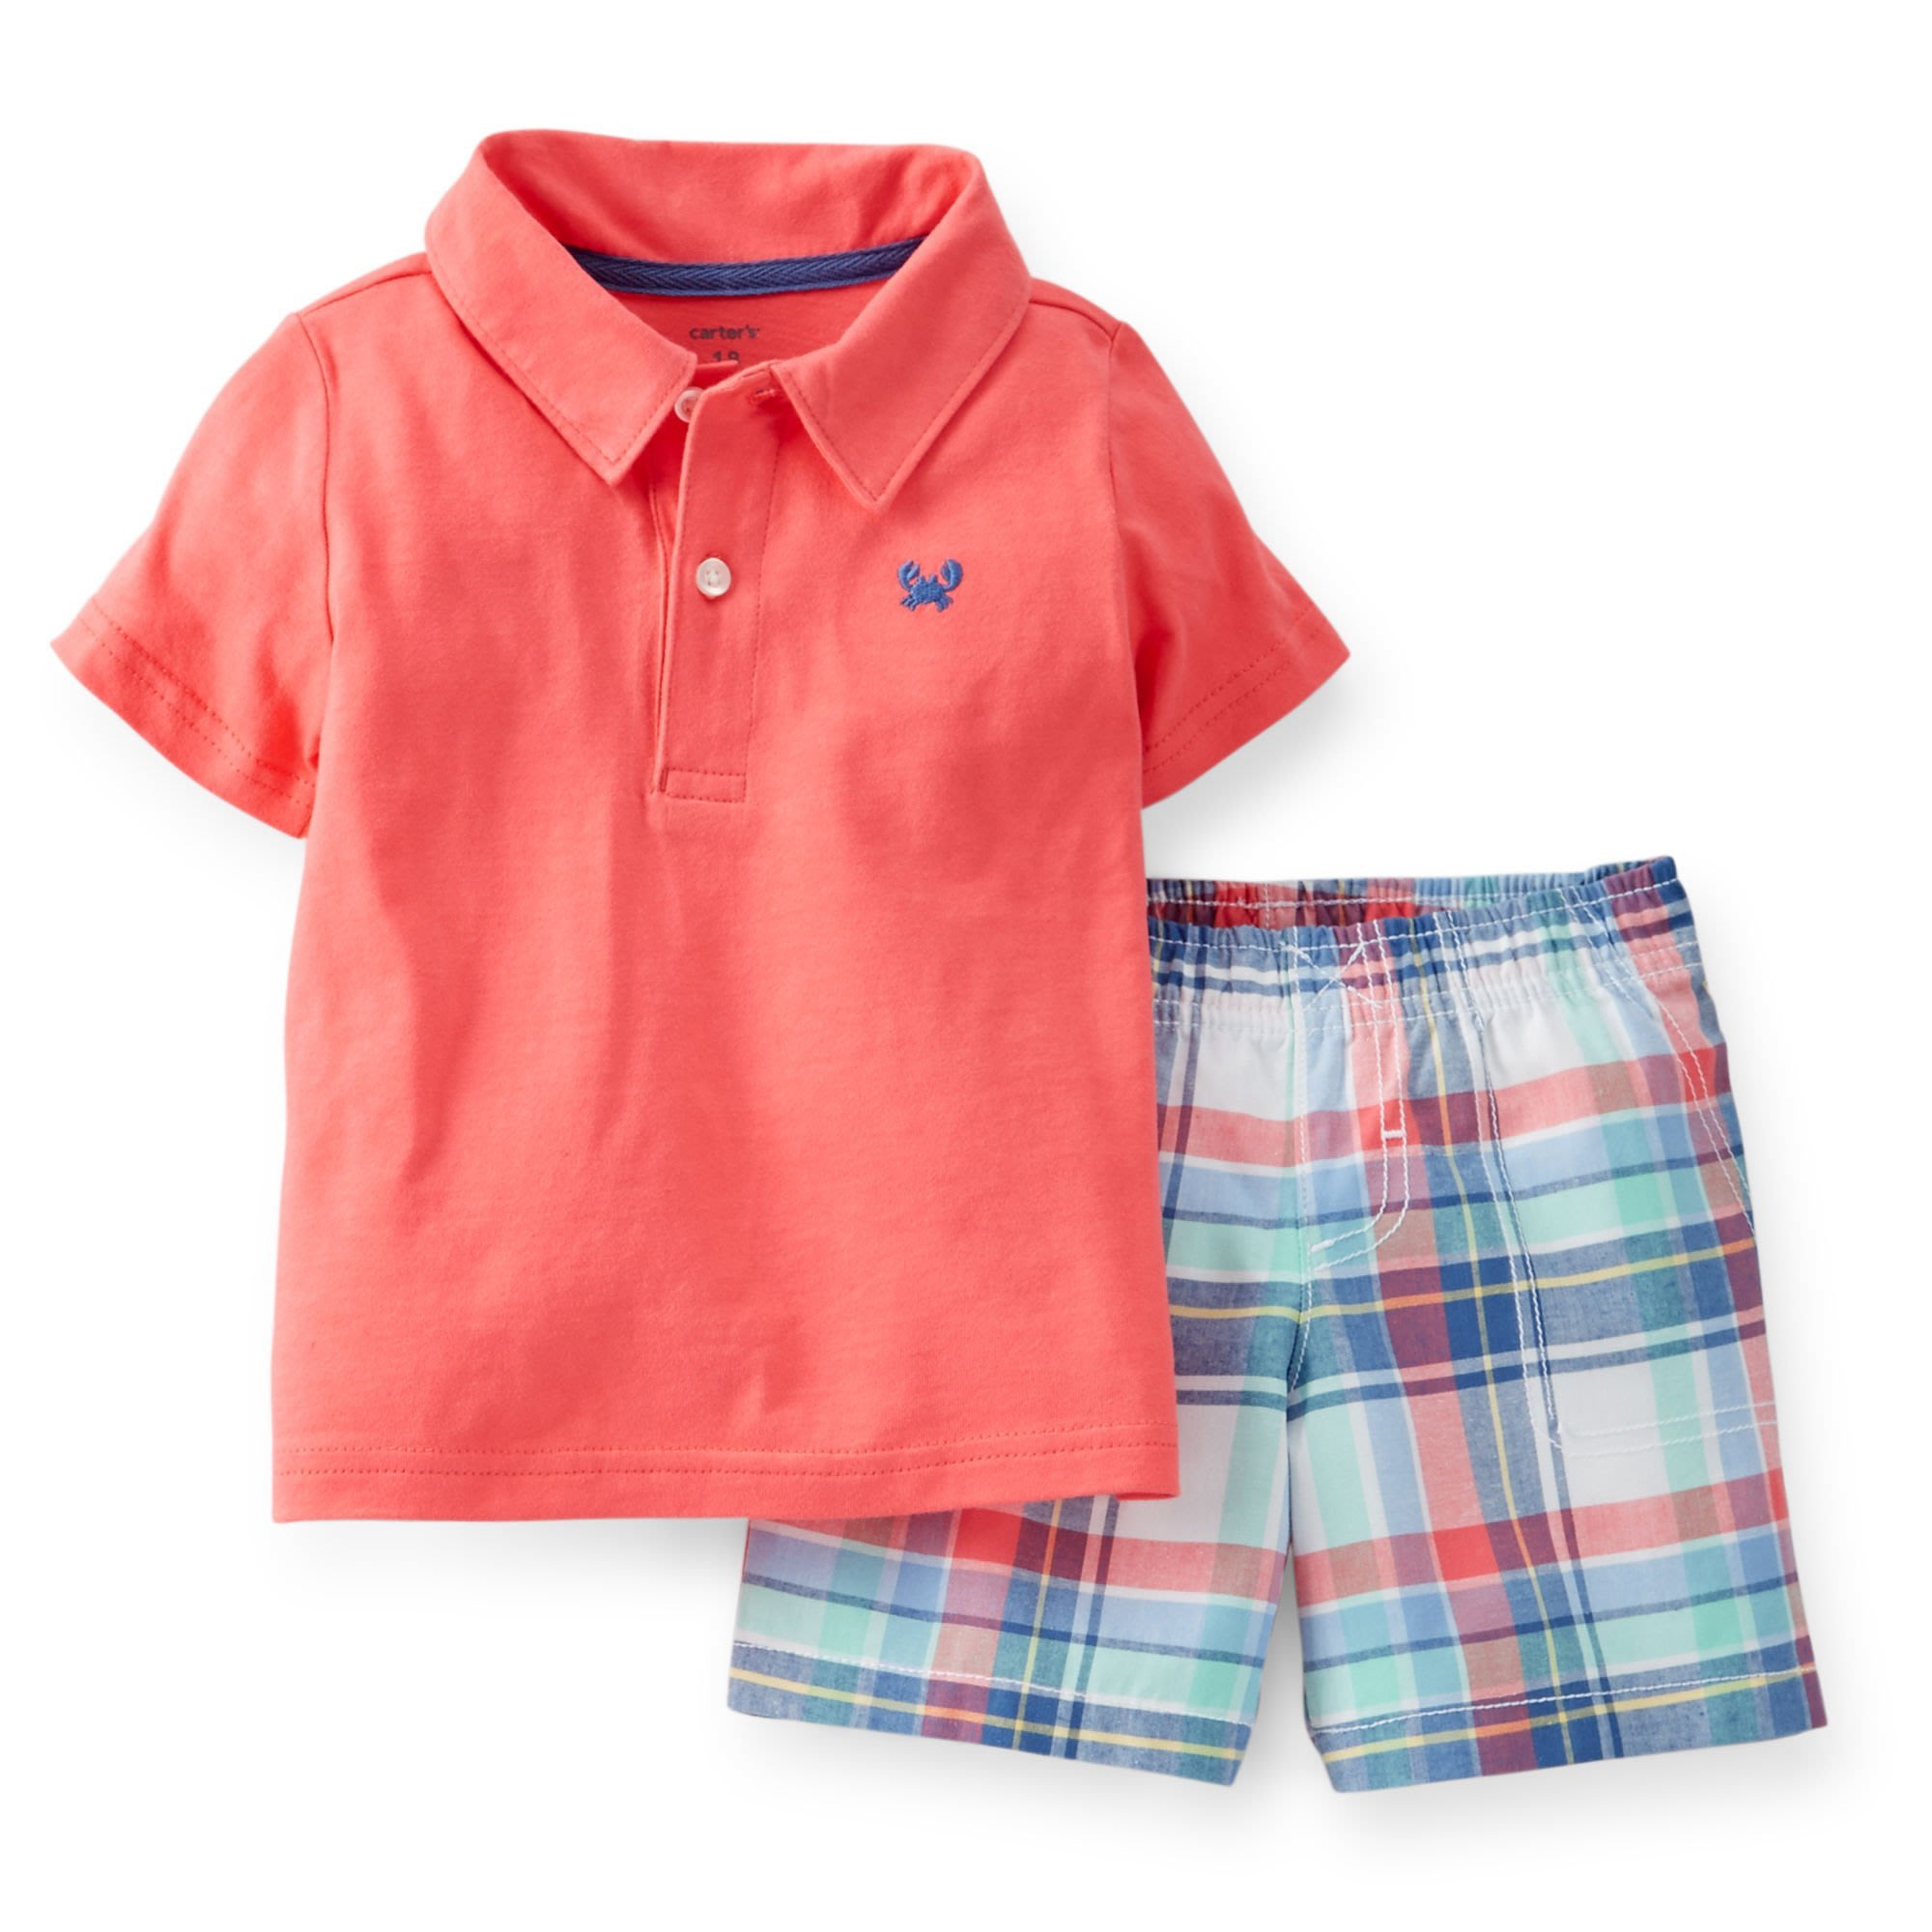 【Nicholes歐美進口優質童裝】Carters 男童短袖POLO上衣+格子短褲二件組*OLD NAVY